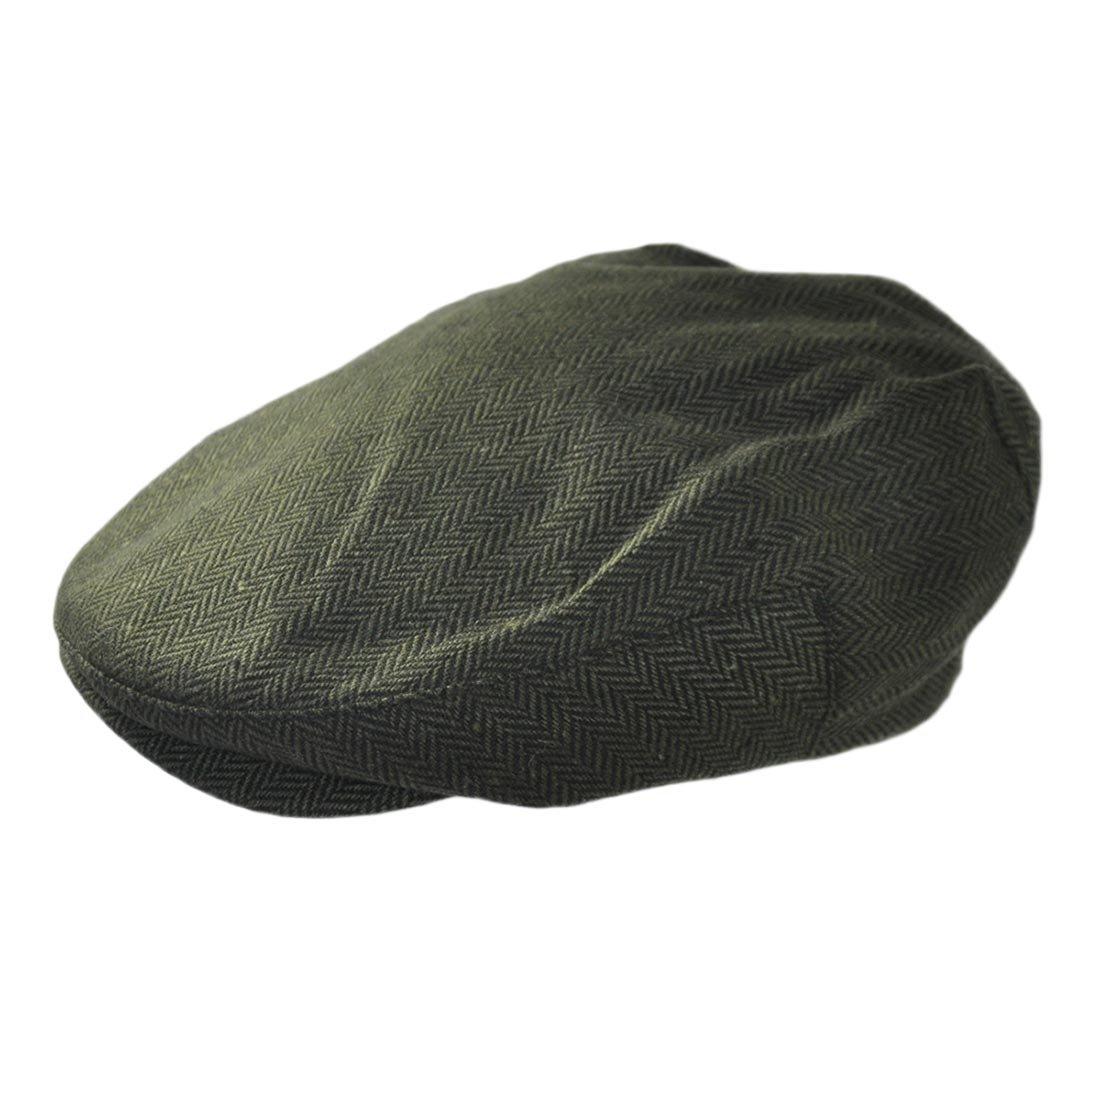 Irish Design Tweeds Herringbone Adjustable Flat Cap, Green colour Carrolls Irish Gifts